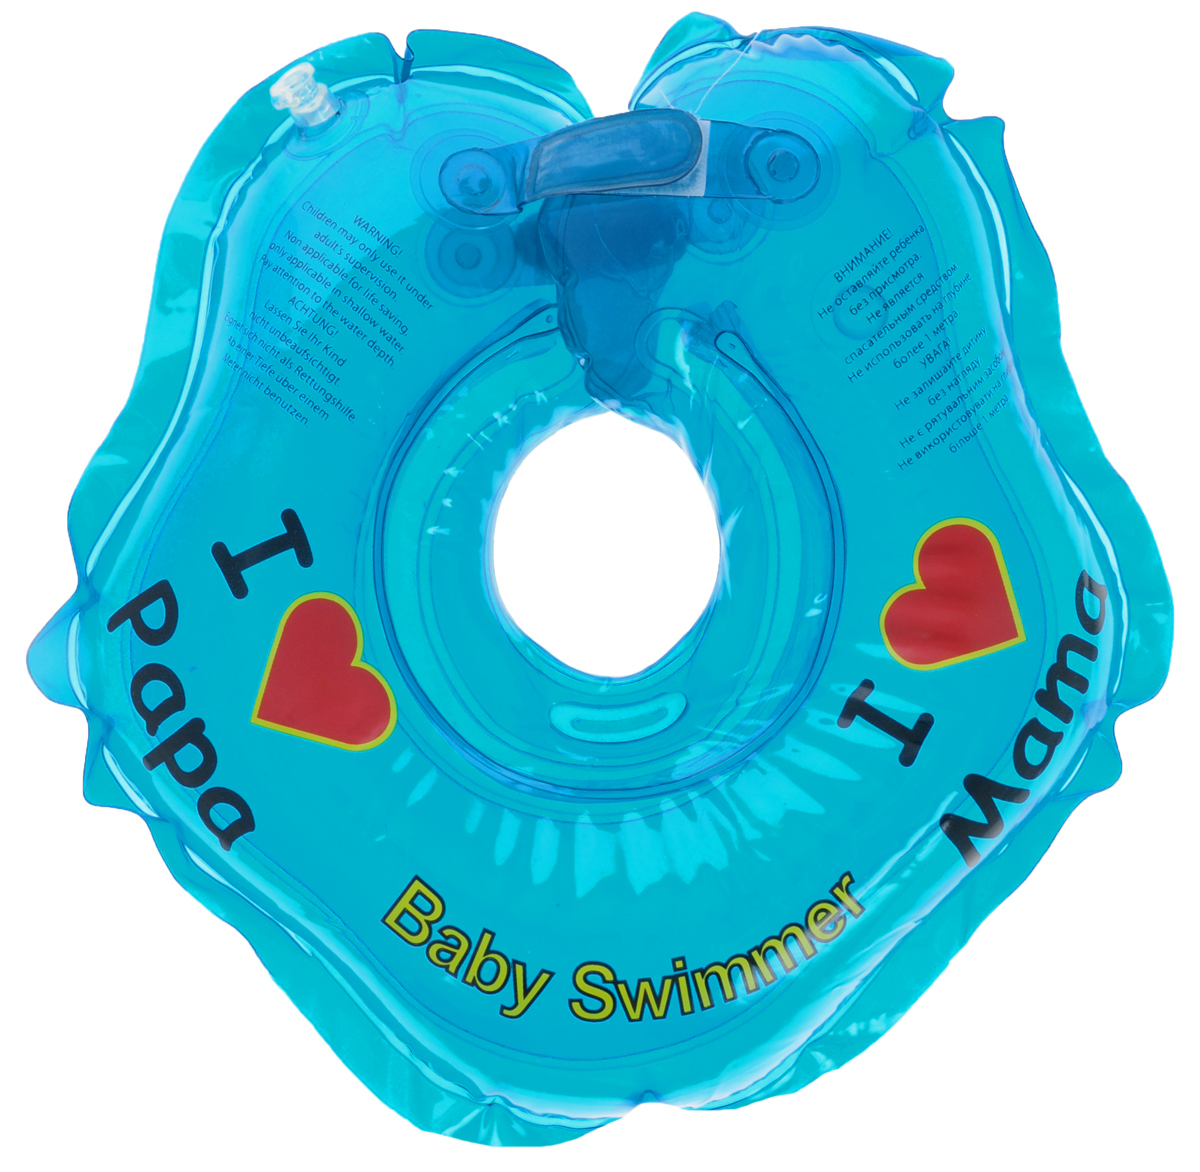 Baby Swimmer Круг на шею цвет голубой 3-12 кг roxi kids fl002 круг на шею для купания малышей